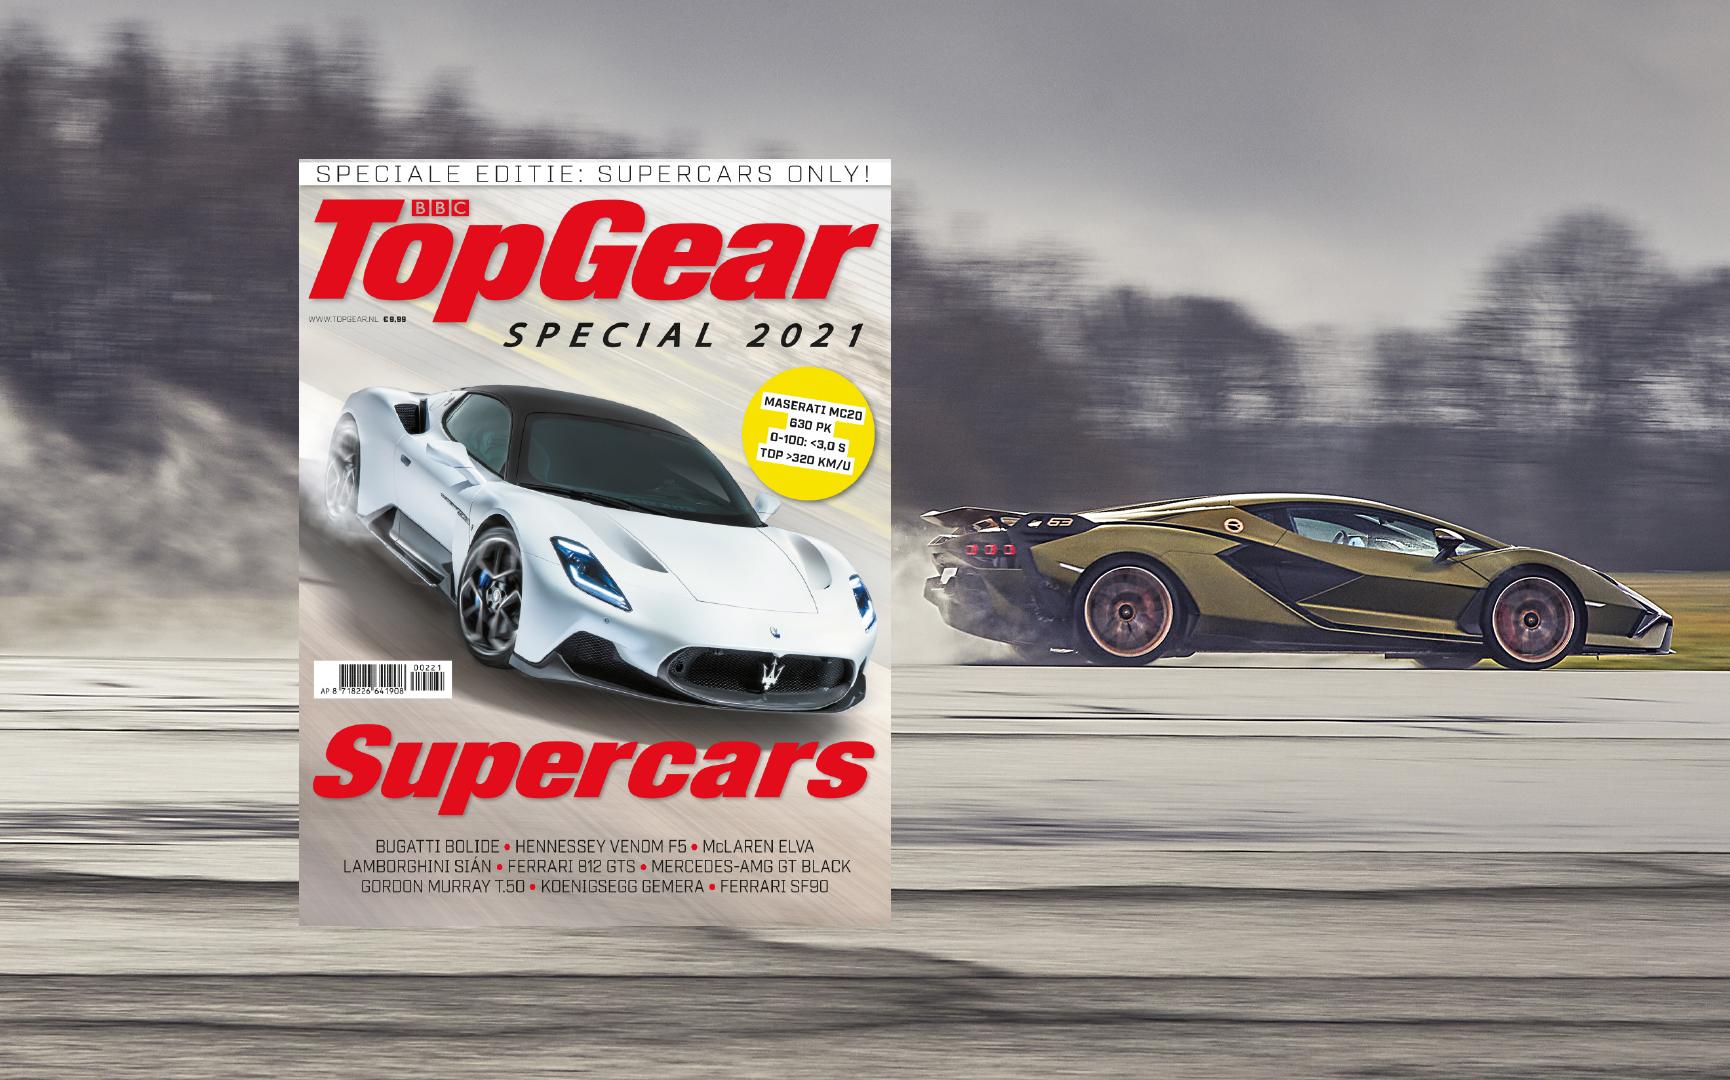 TopGear Supercars 2021